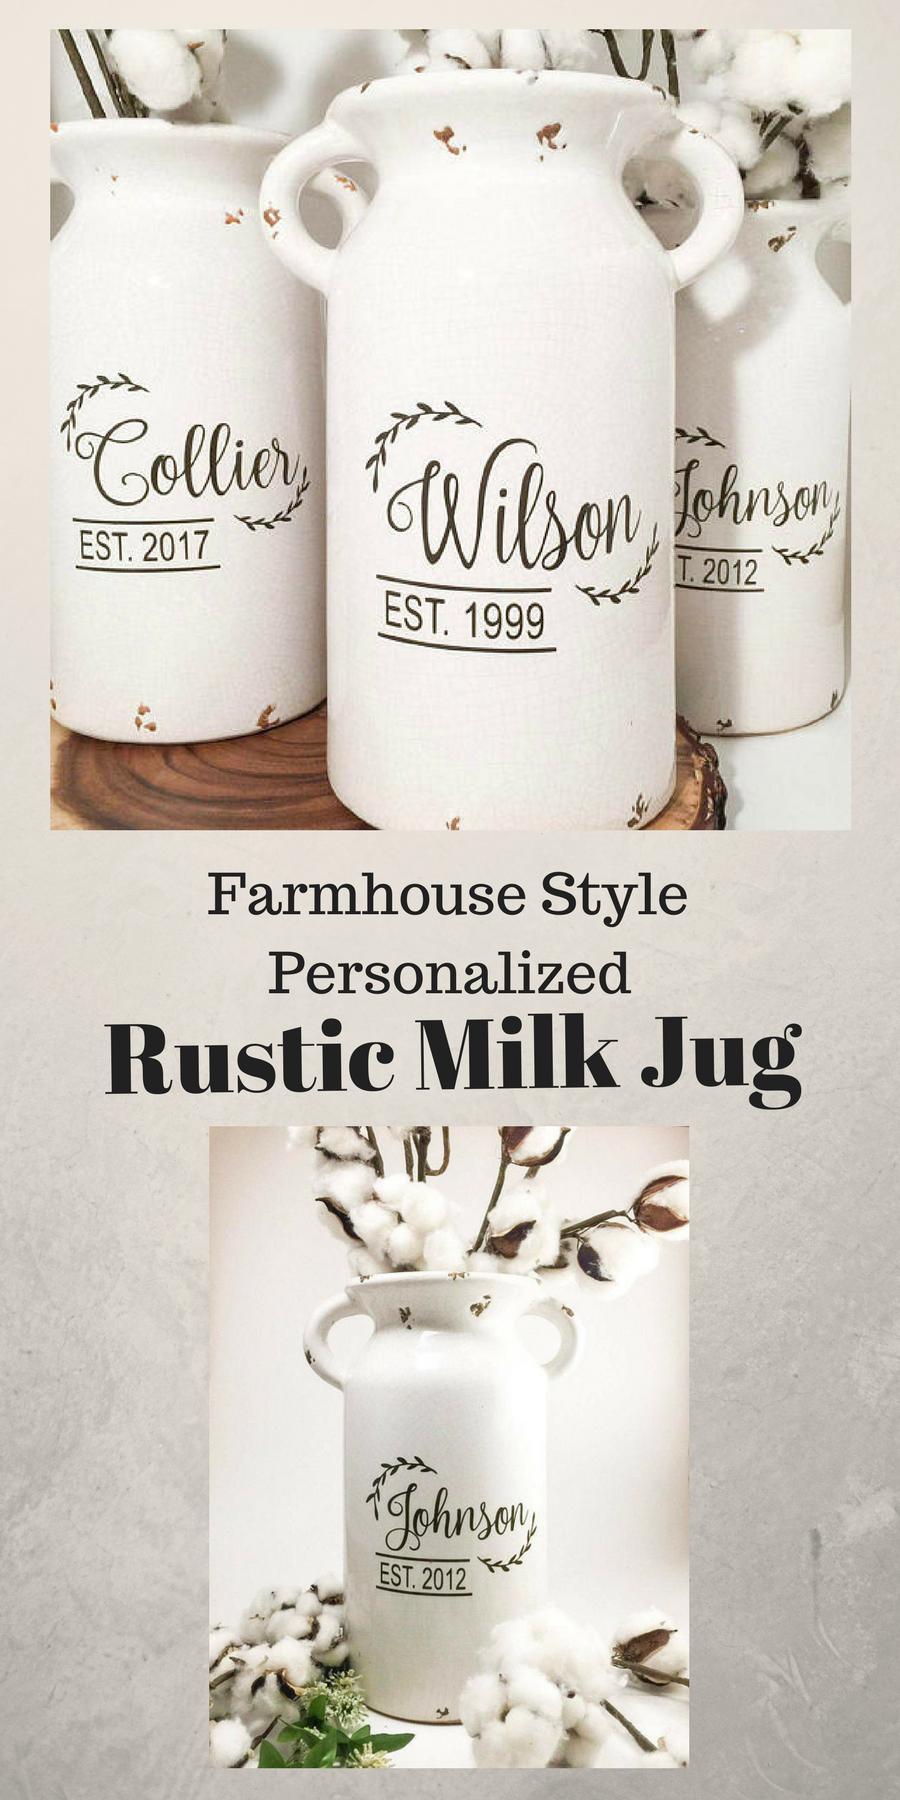 This vintage milk jug\Farmhouse Style Home Decor piece is